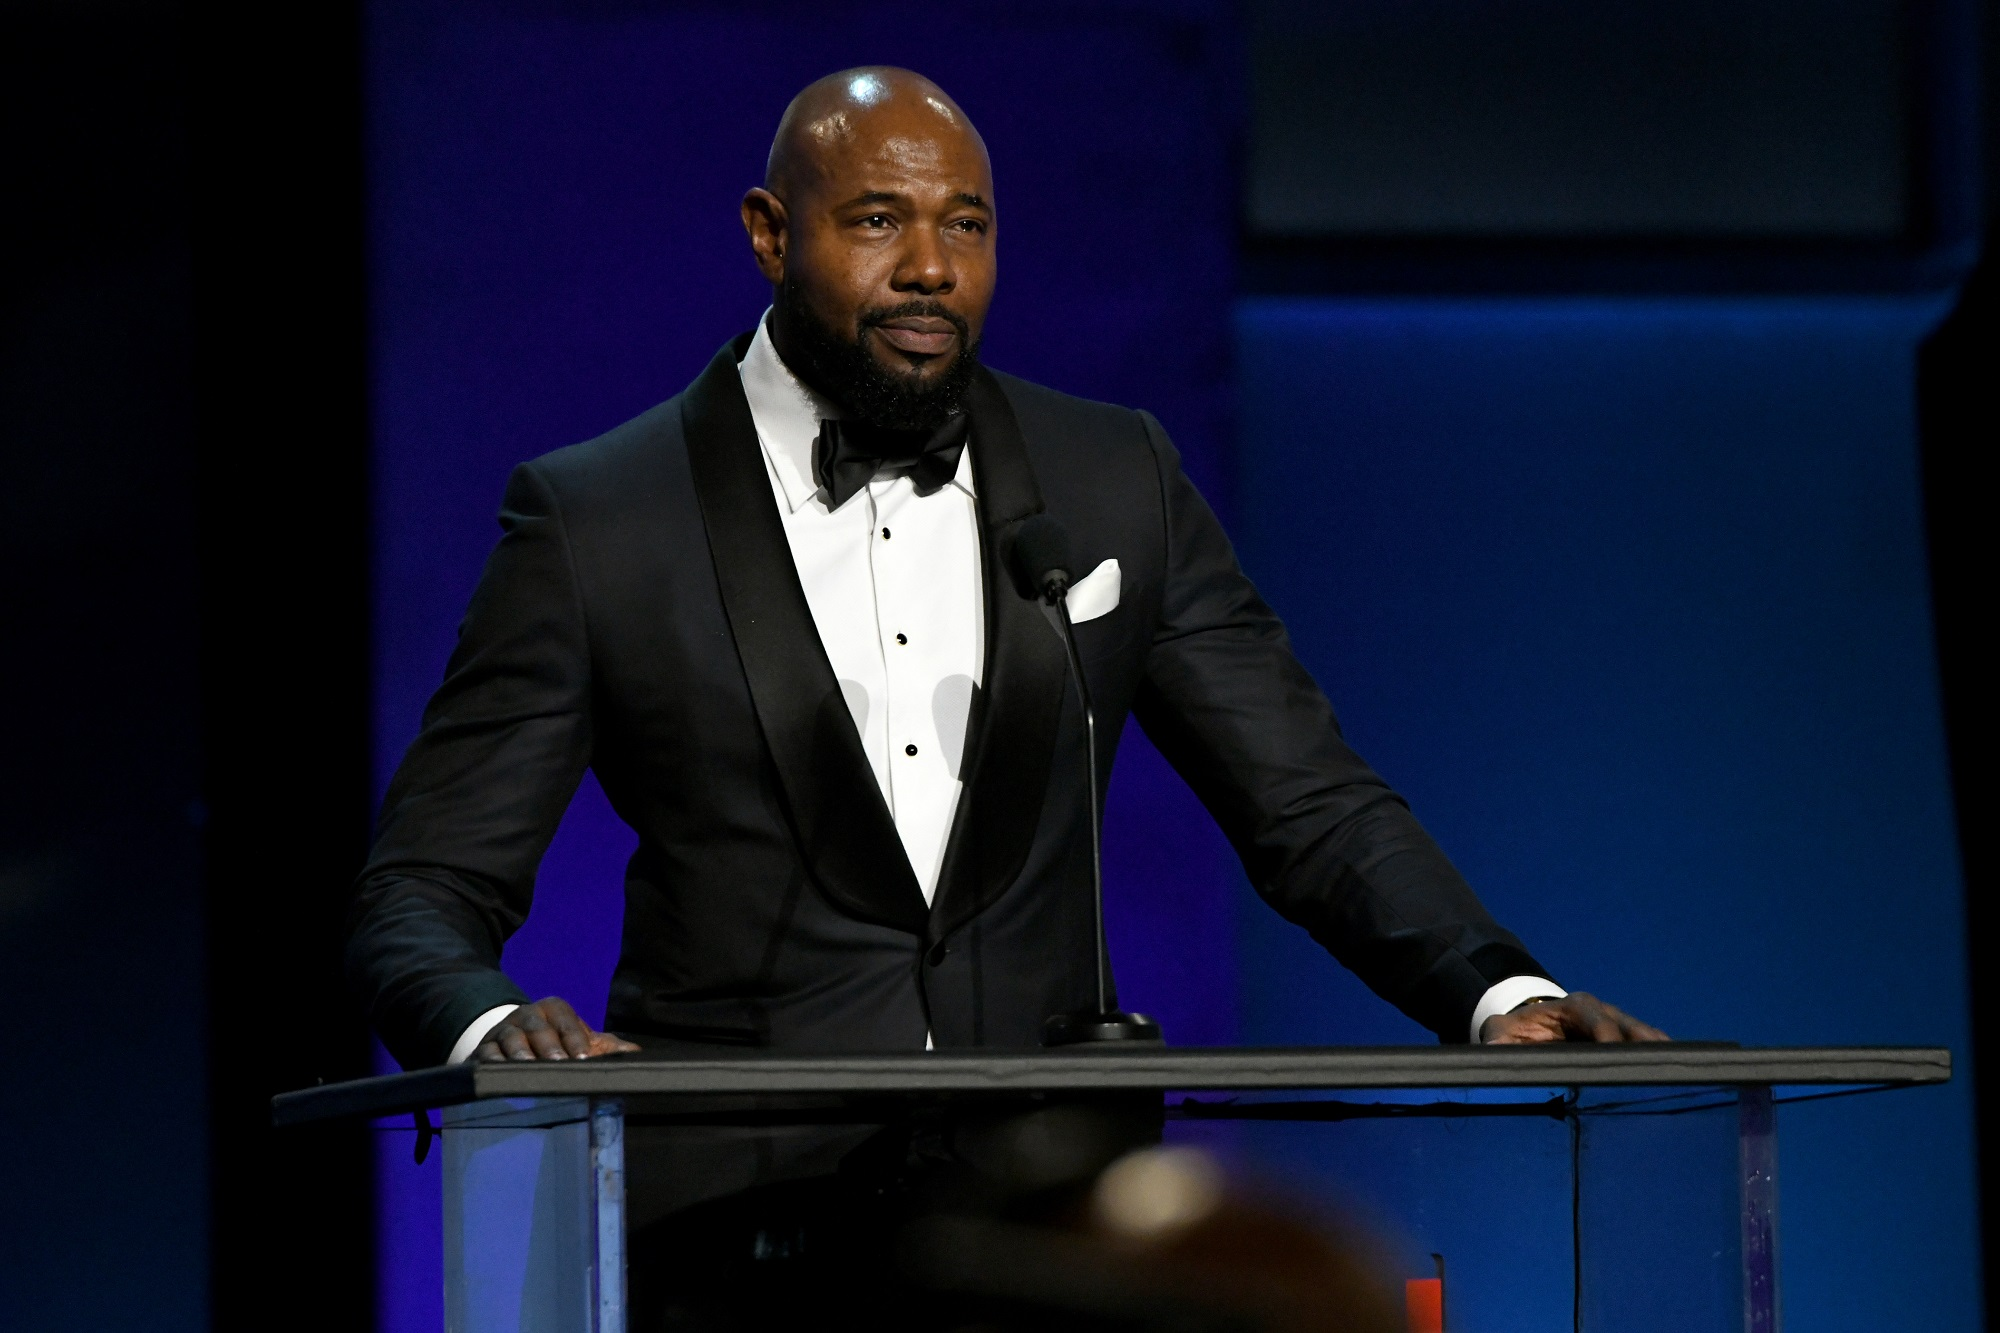 'Emancipation' director Antoine Fuqua canceled Georgia plans